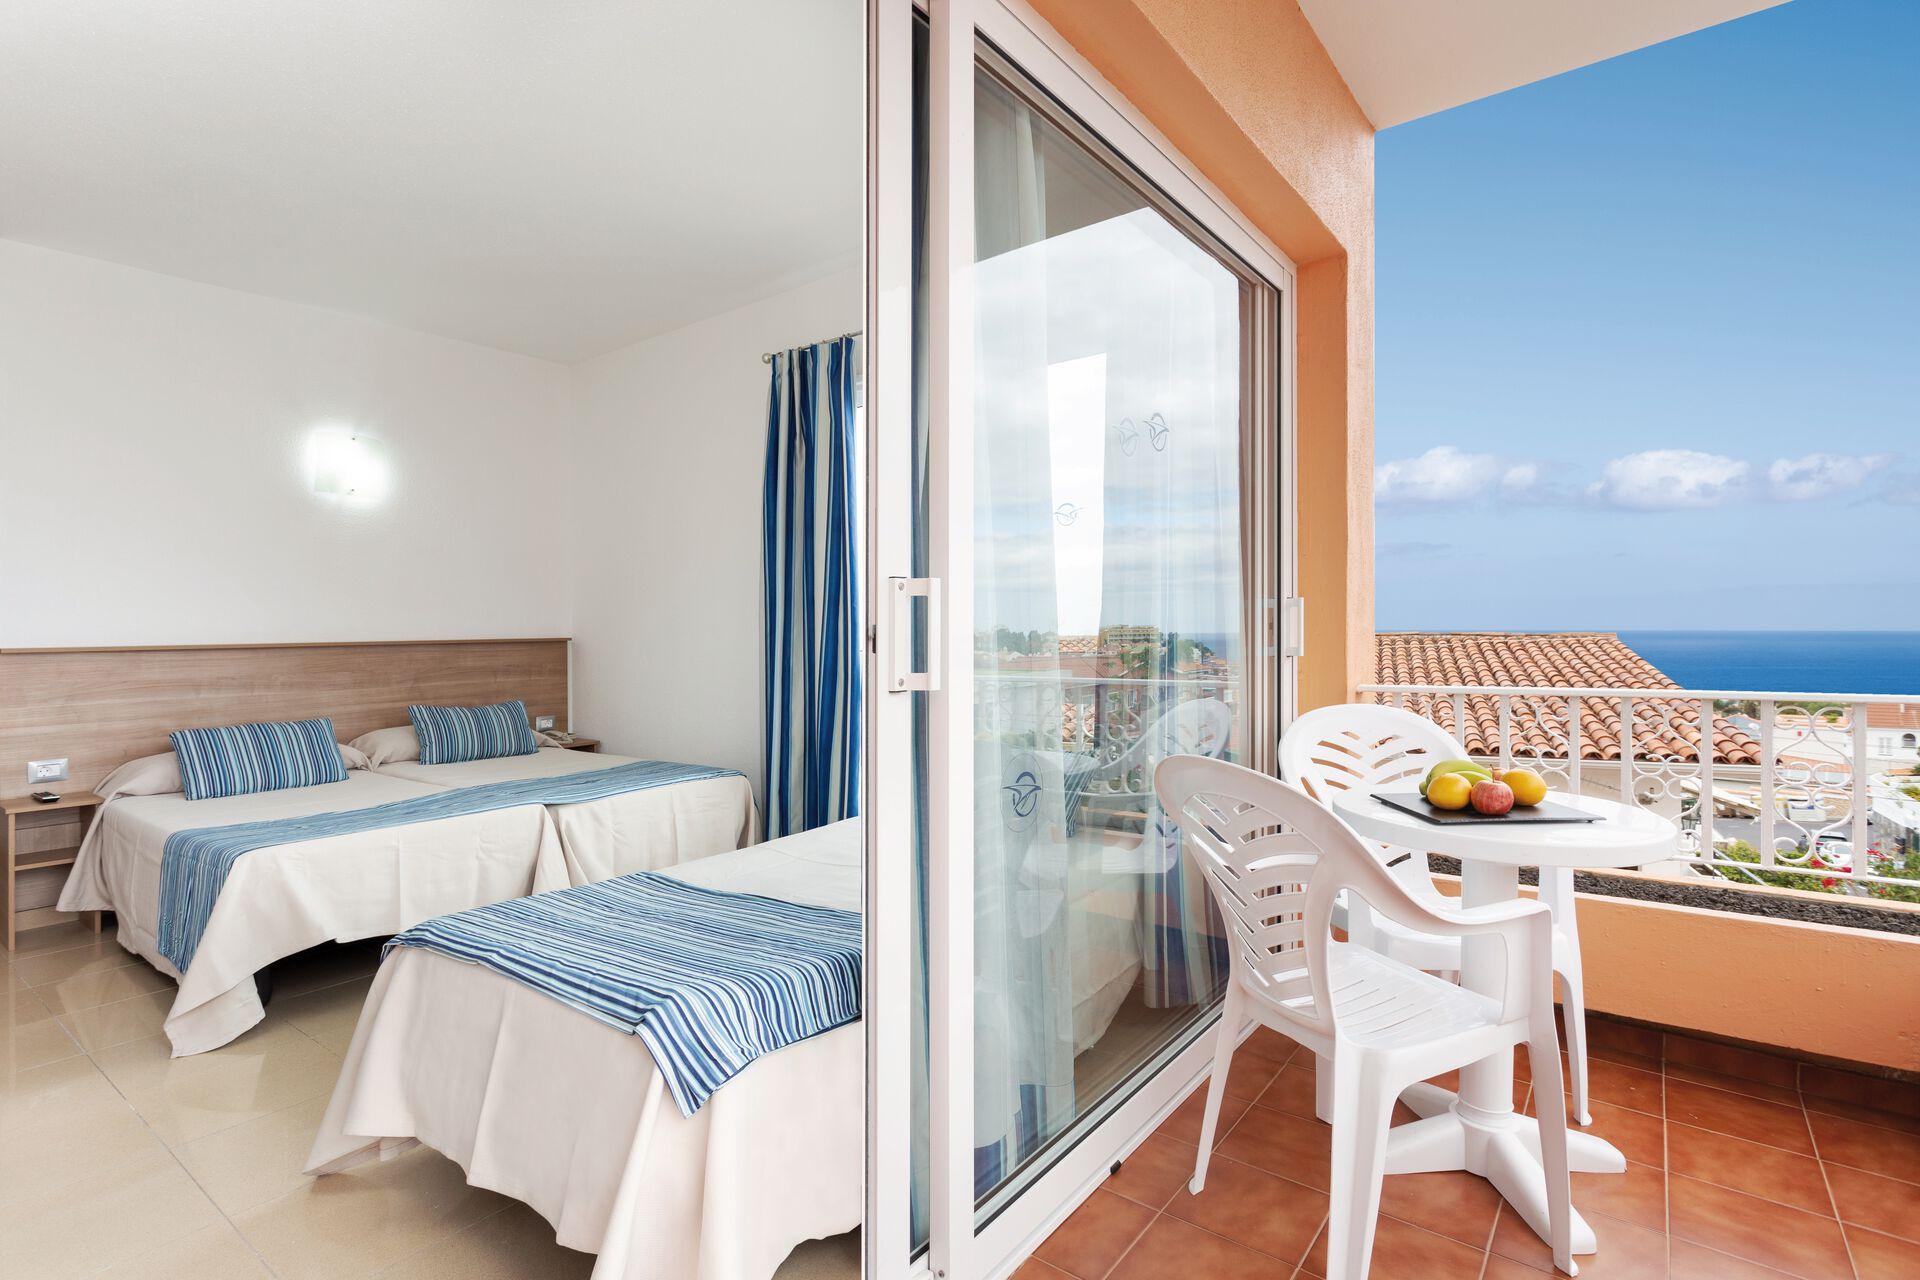 Canaries - Tenerife - Espagne - Hôtel Globales Acuario 2*